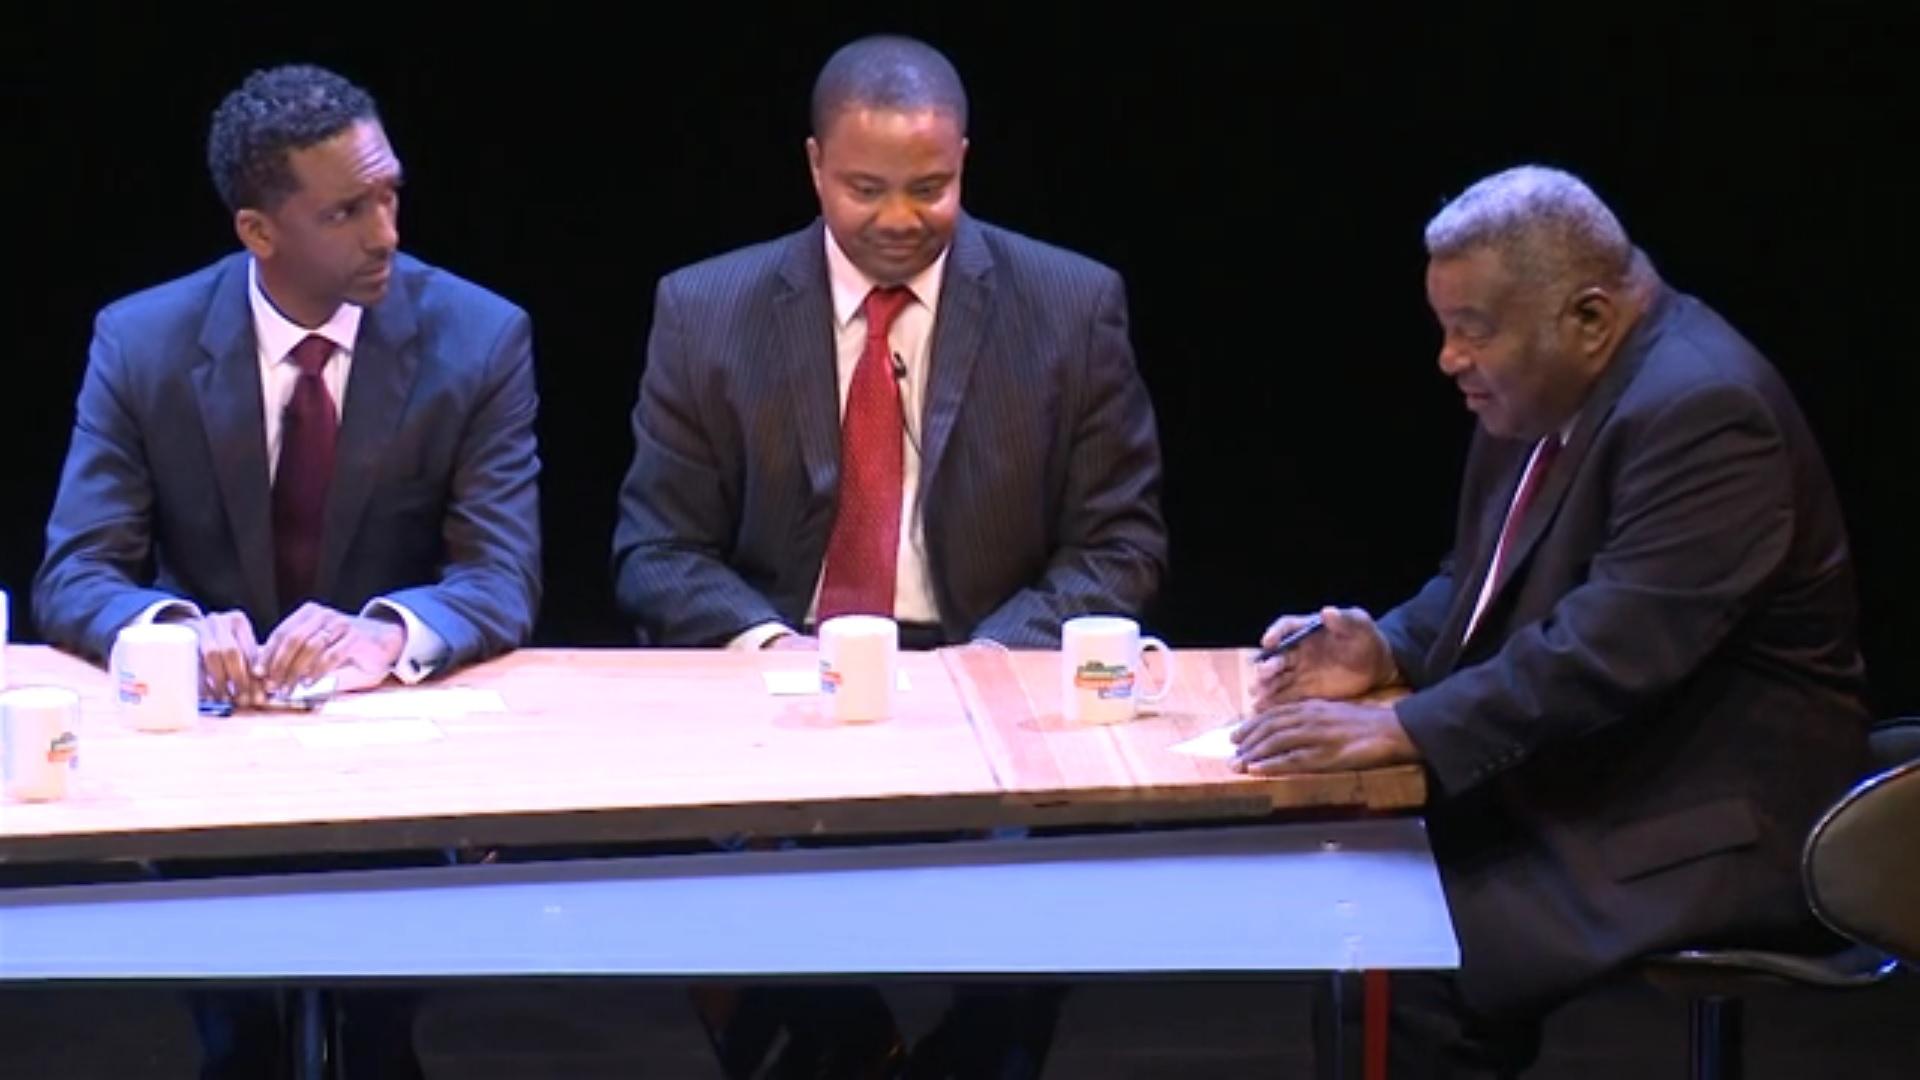 Guillermo Philpotts, right, debates now-State Senator Jesse Hamilton and Rubain Dorancy last year (Screengrab: Brooklyn Independent Media).